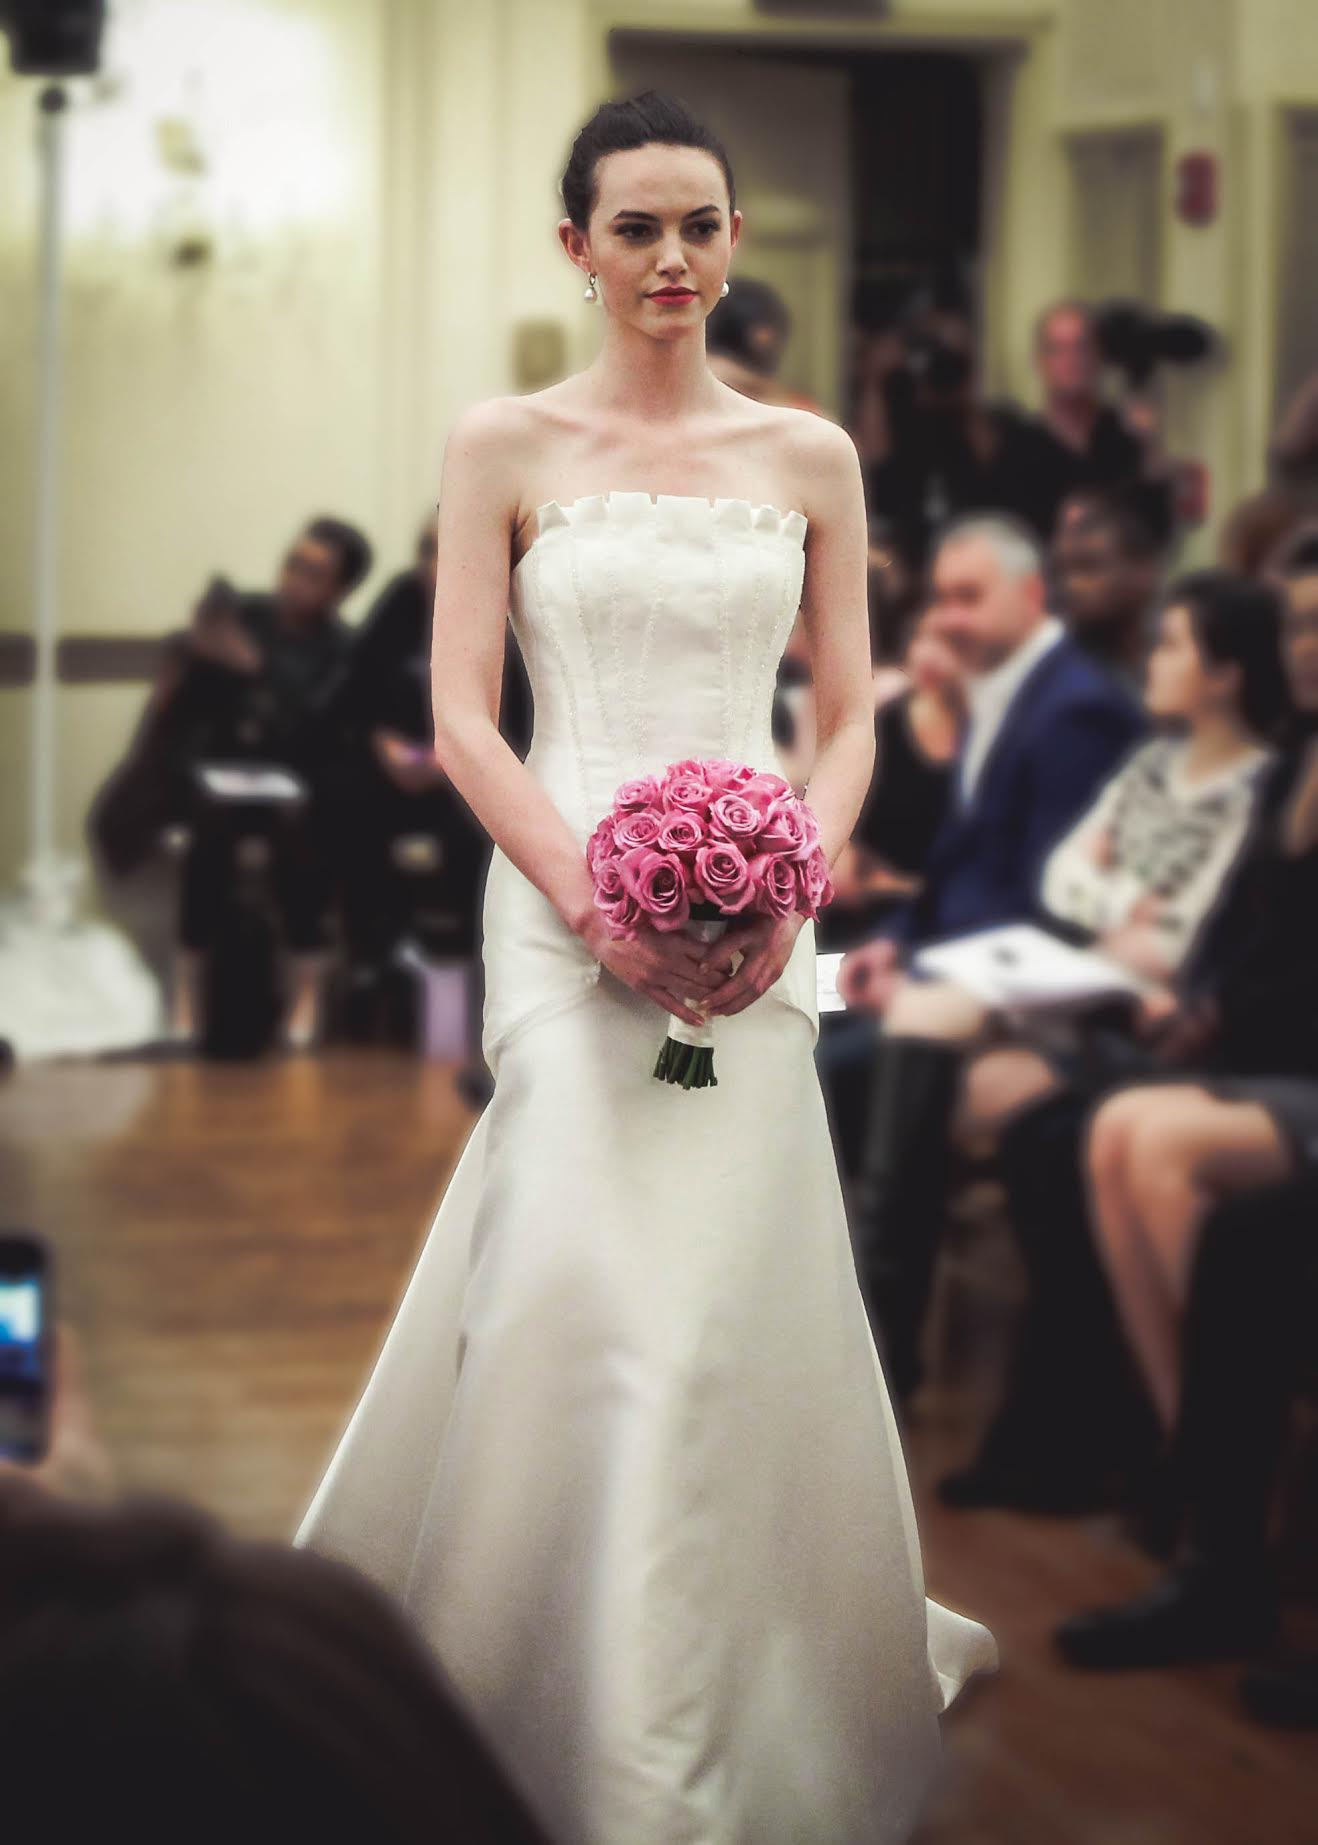 wedding+dress+photography+uppereastside.jpg